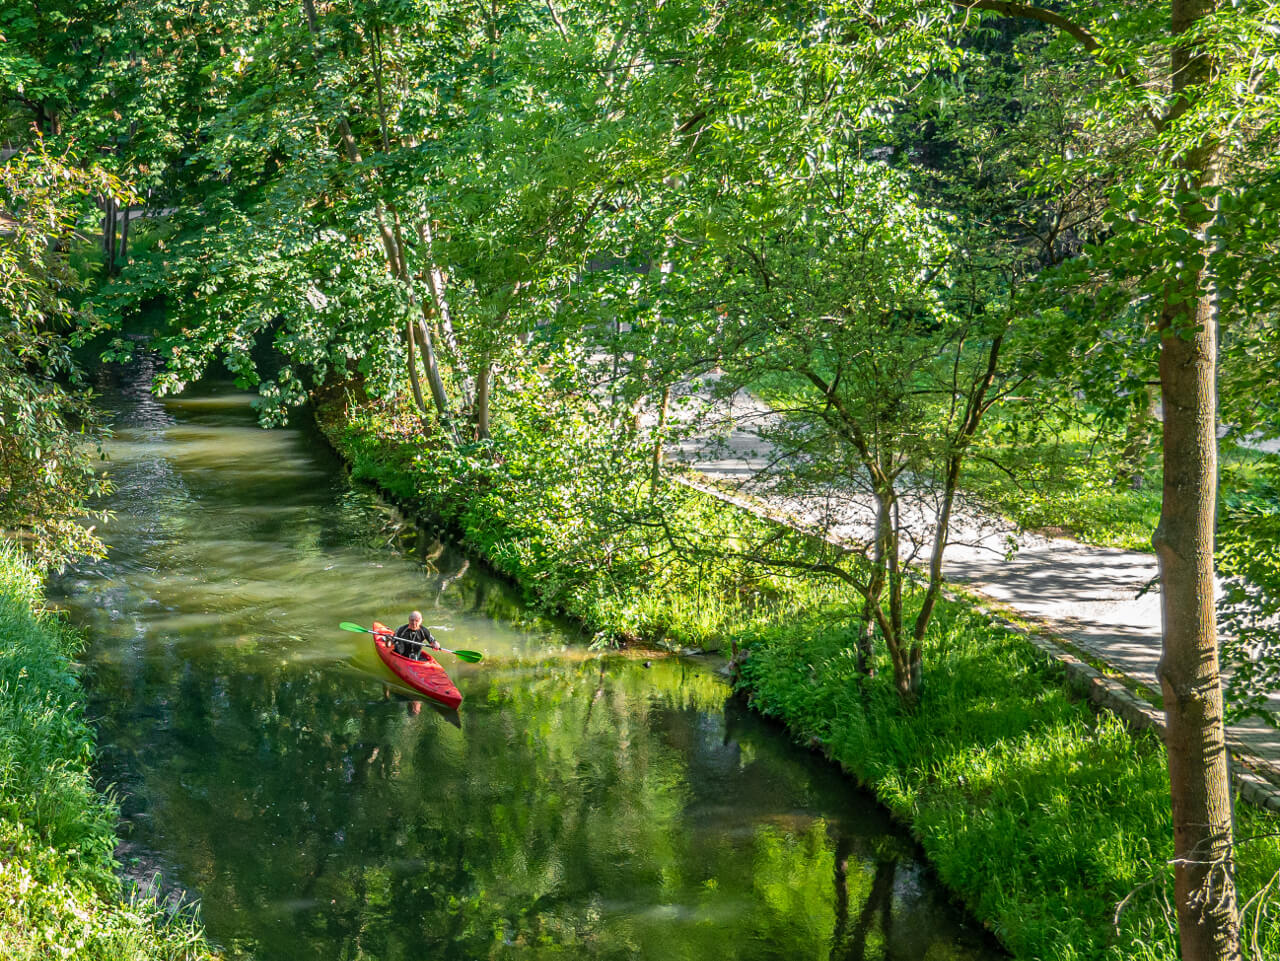 Rzeka Łyna kajak Olsztyn